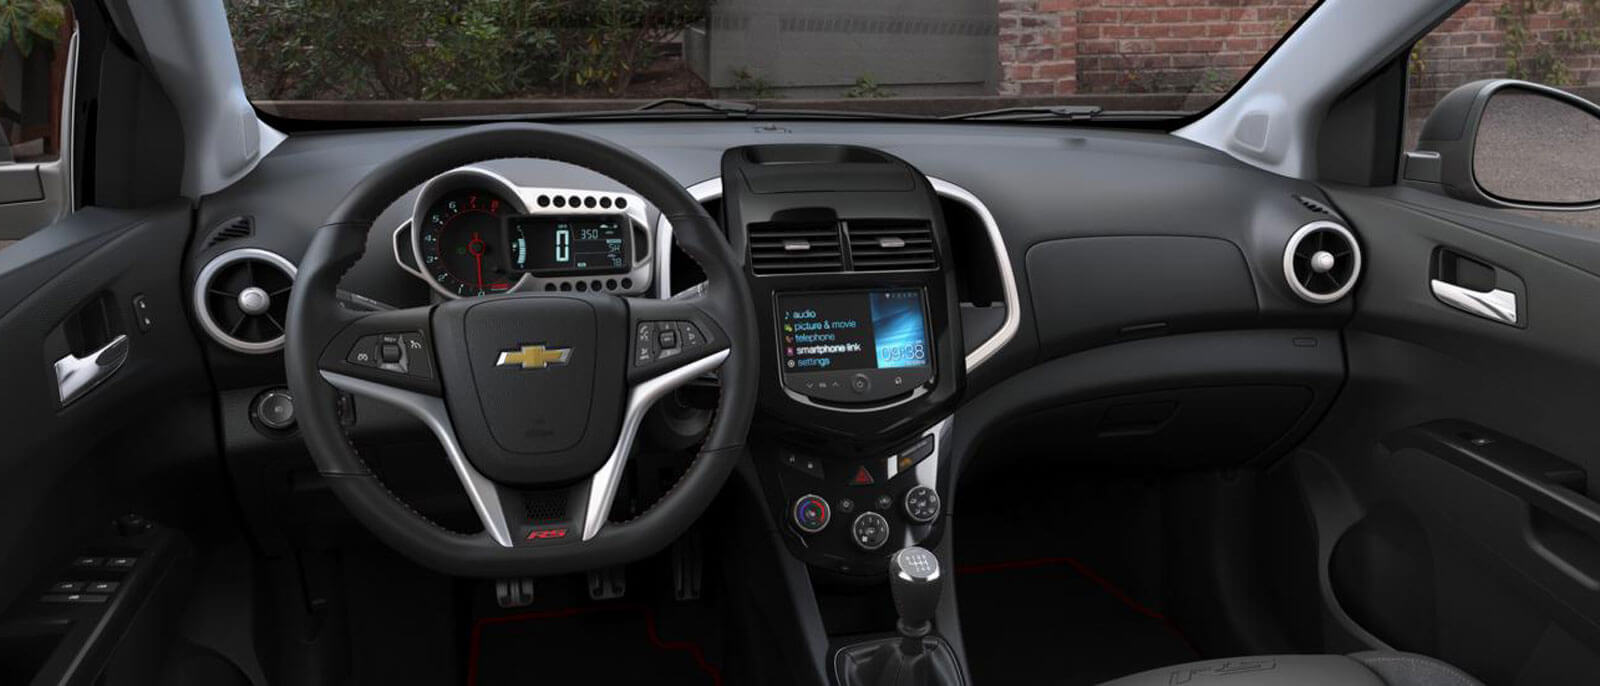 2016 Chevrolet Sonic From Gregg Young Chevrolet Norwalk